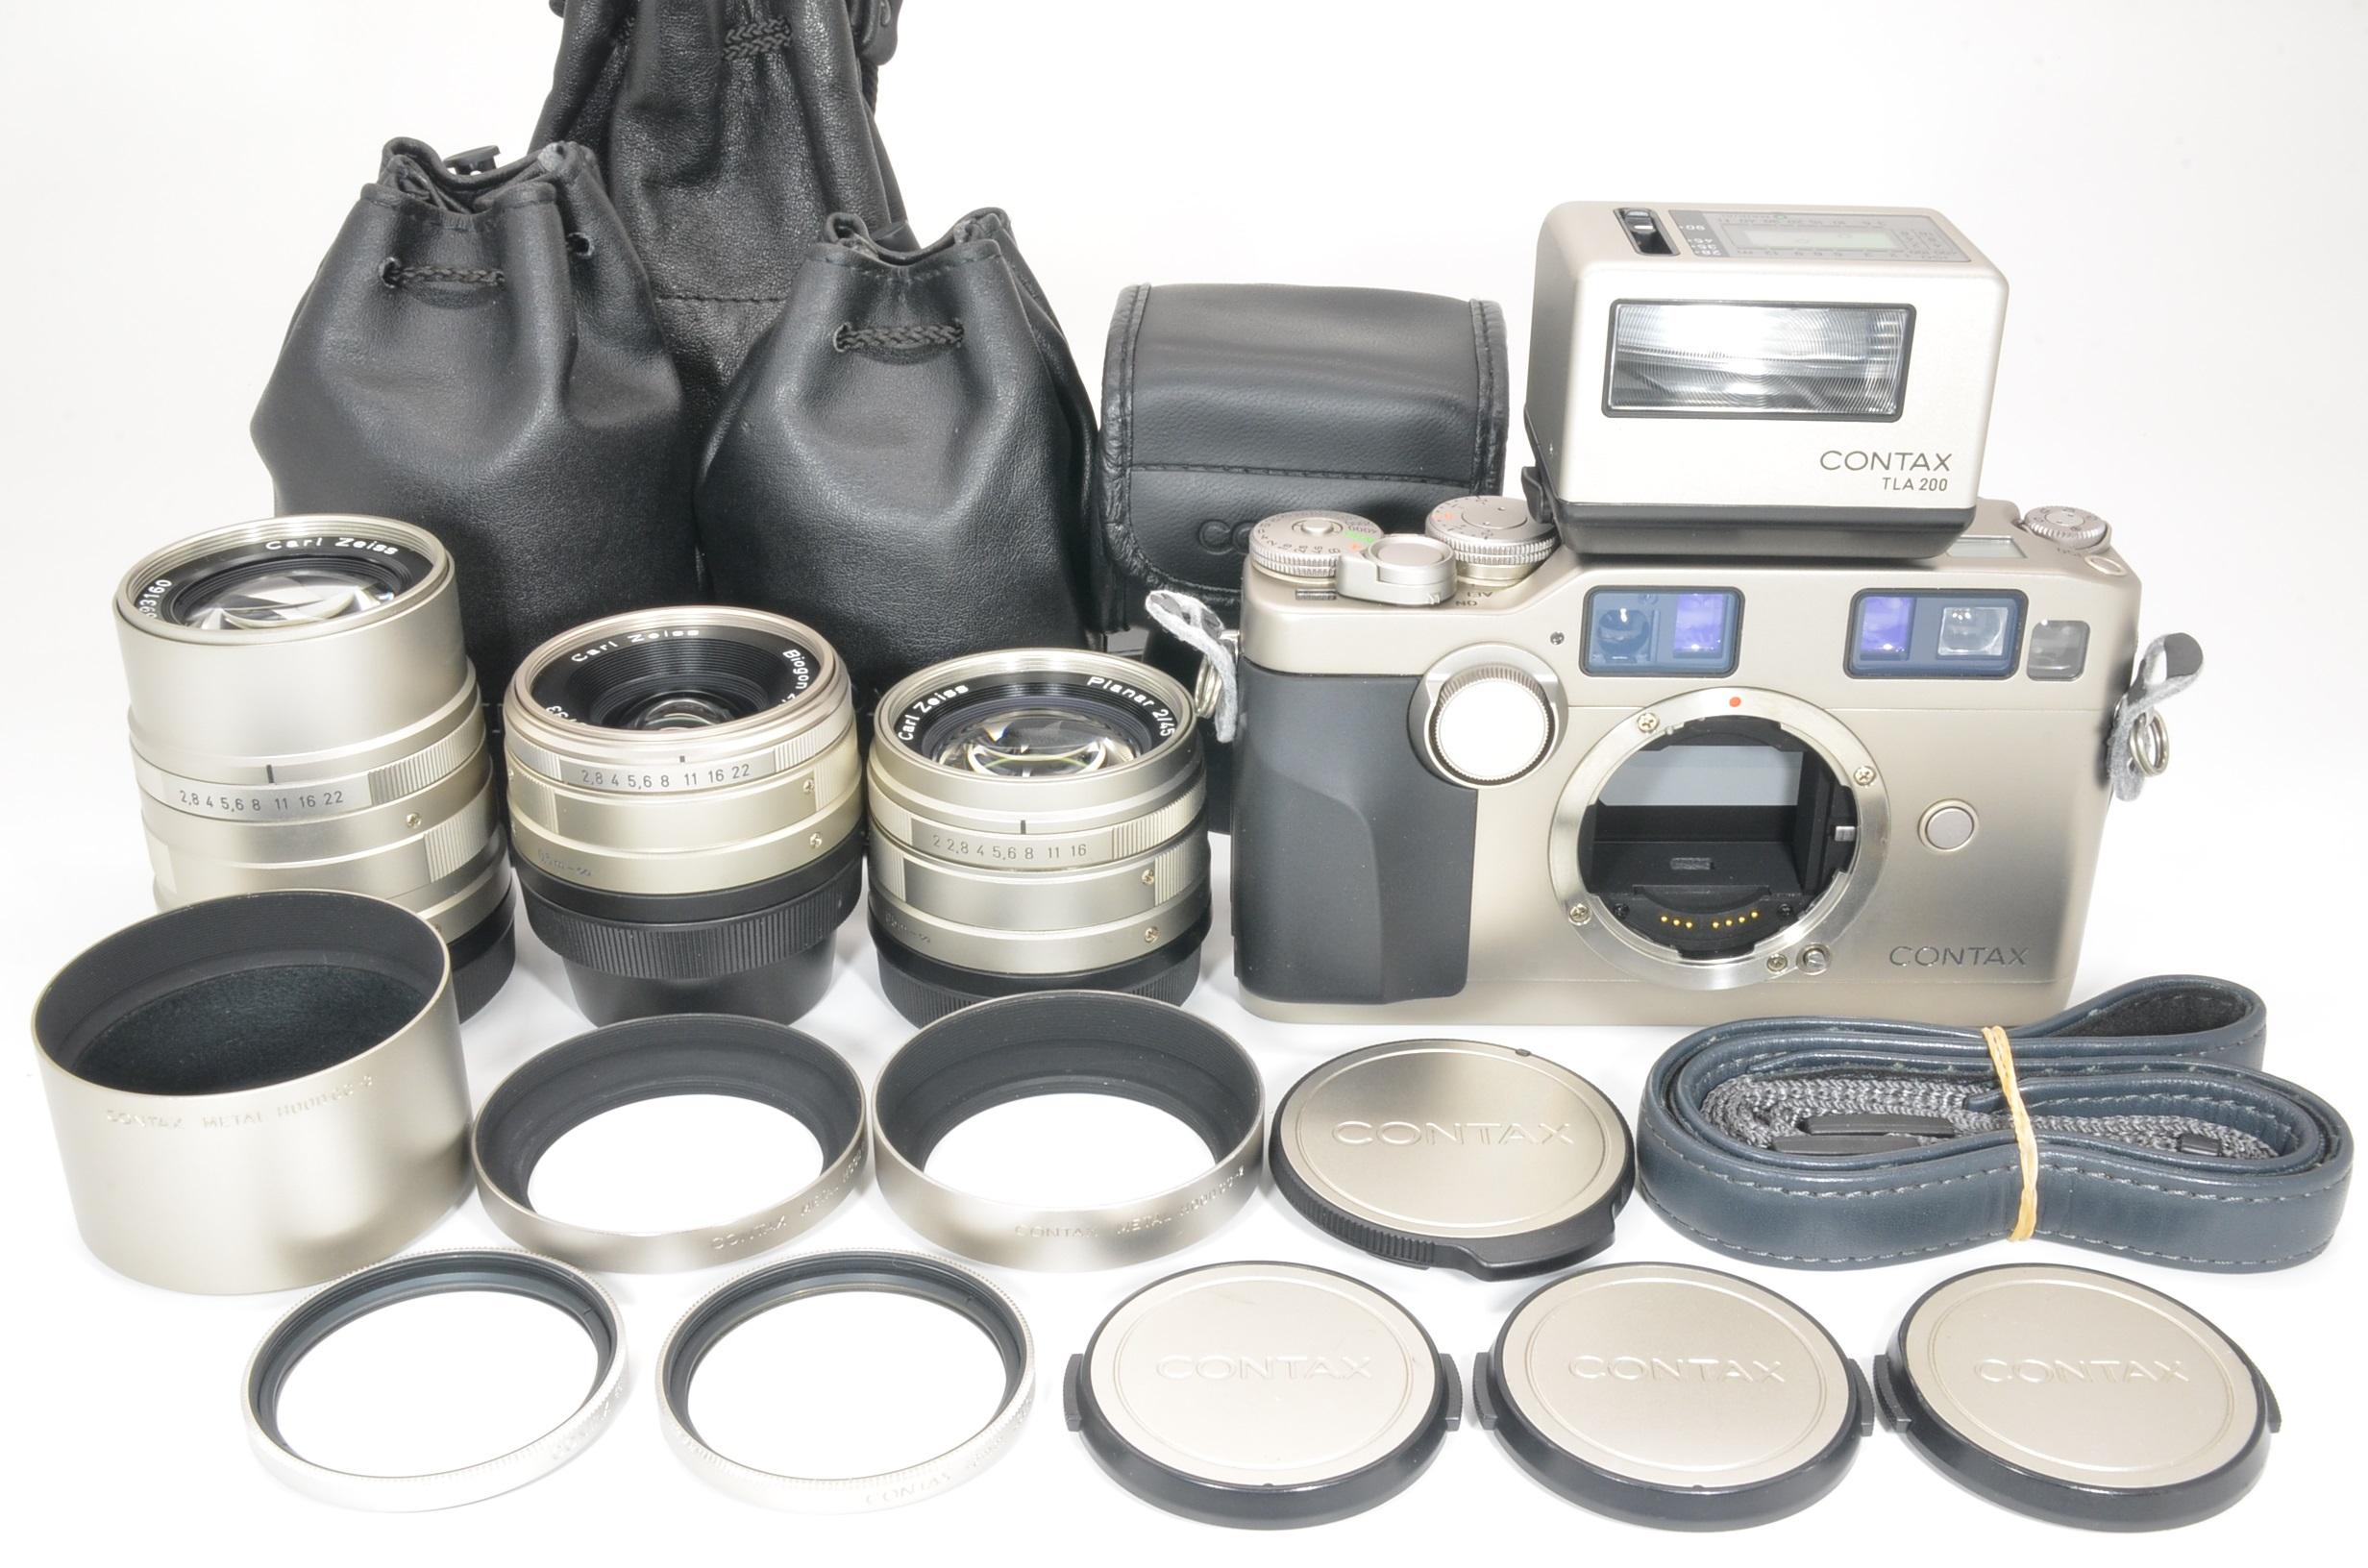 contax g2 w/ planar 45mm, biogon 28mm, sonnar 90mm, tla200  shooting tested